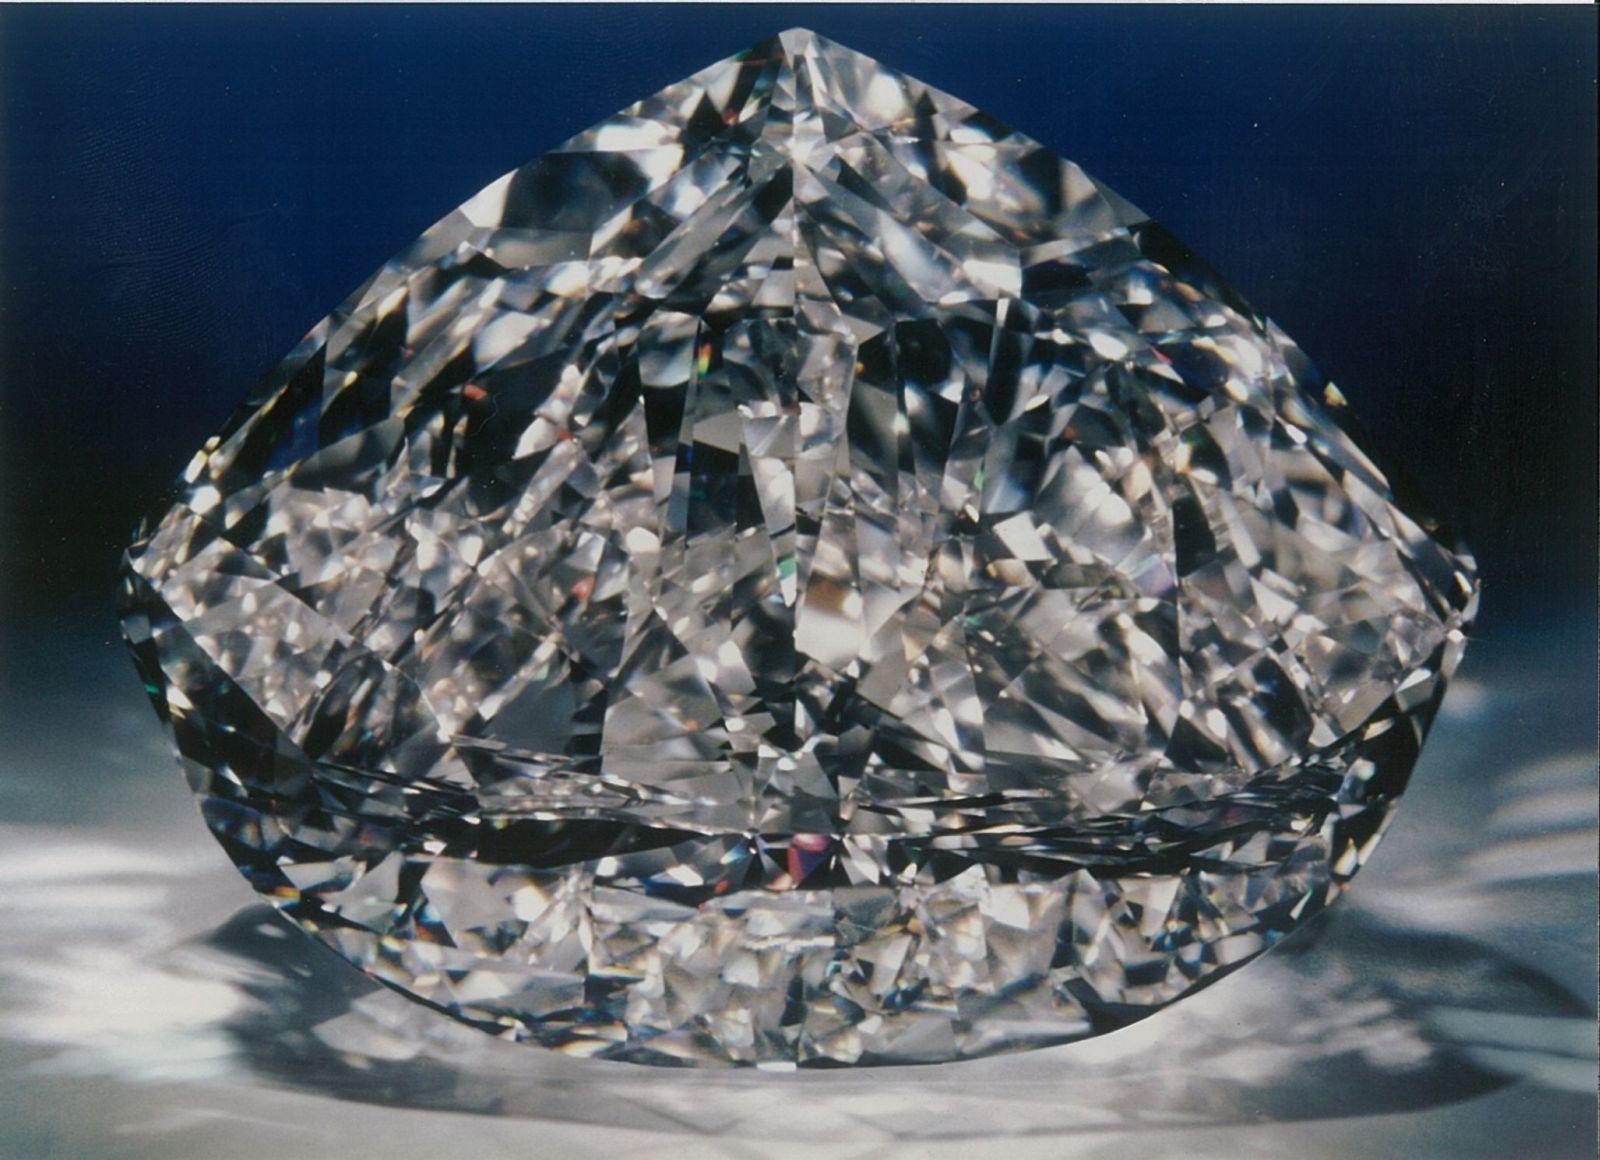 Diamant má téměř 600 karátů.